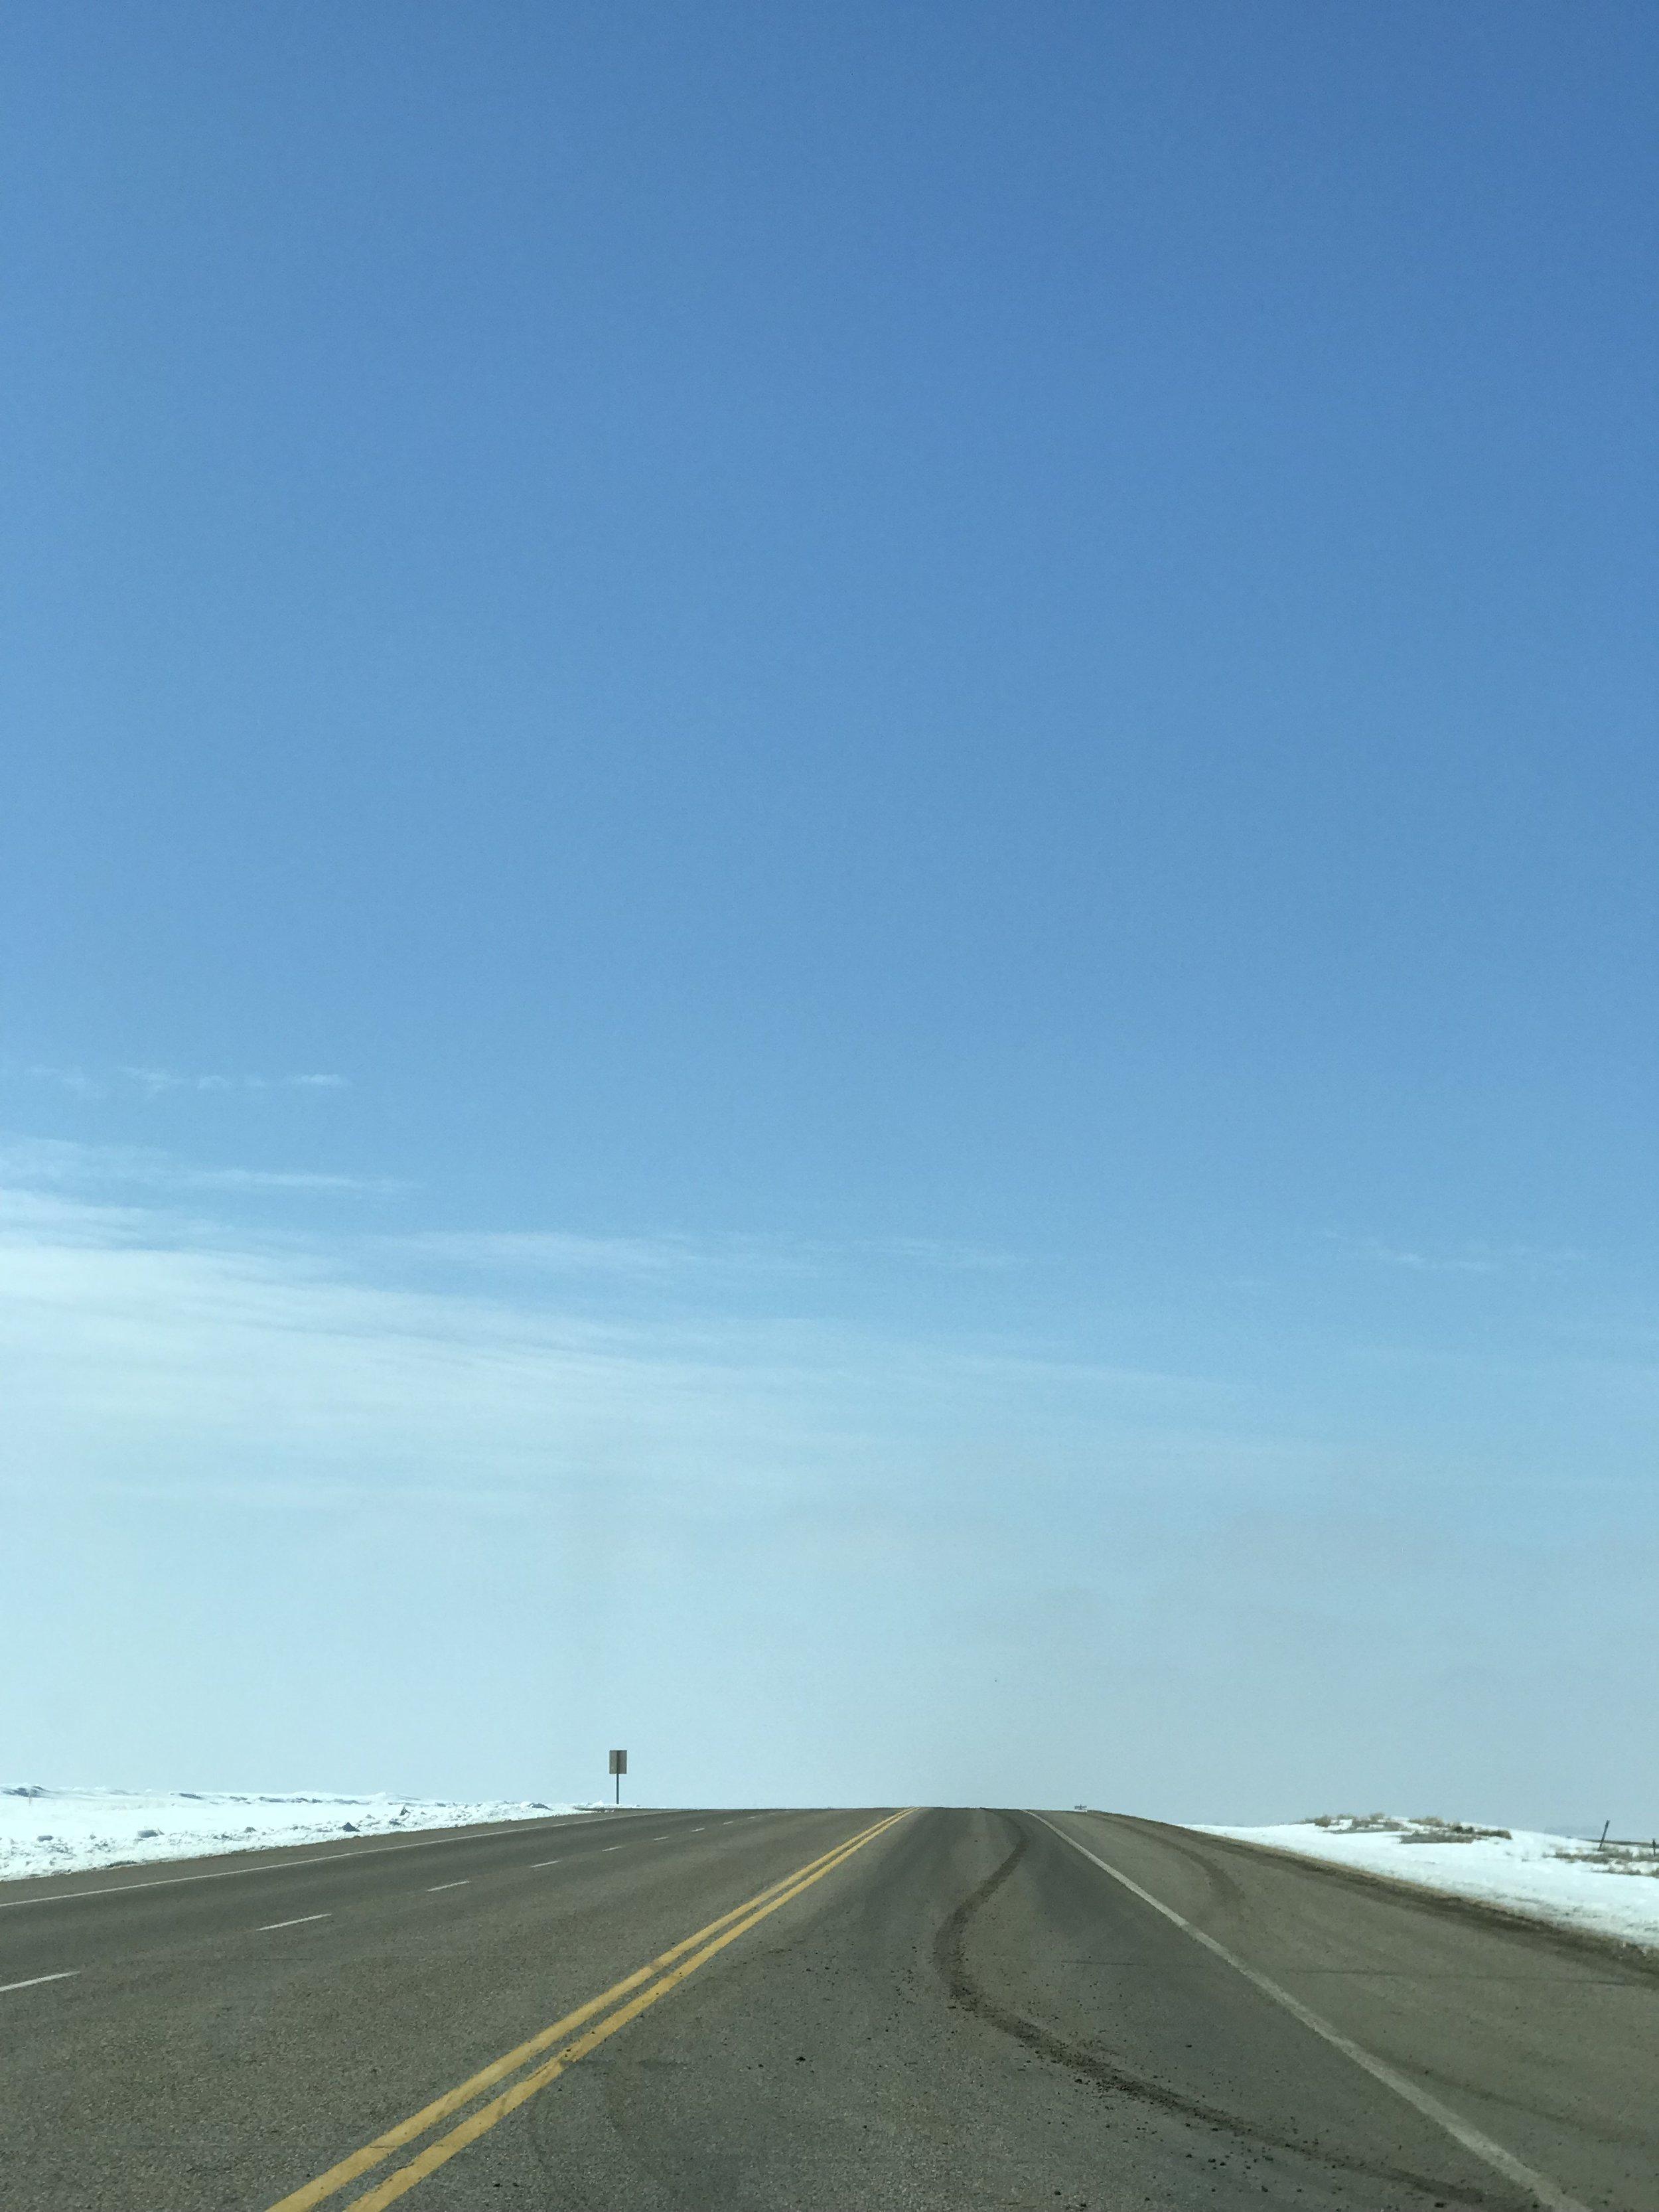 Prairie sky on the road to Lethbridge, Alberta.